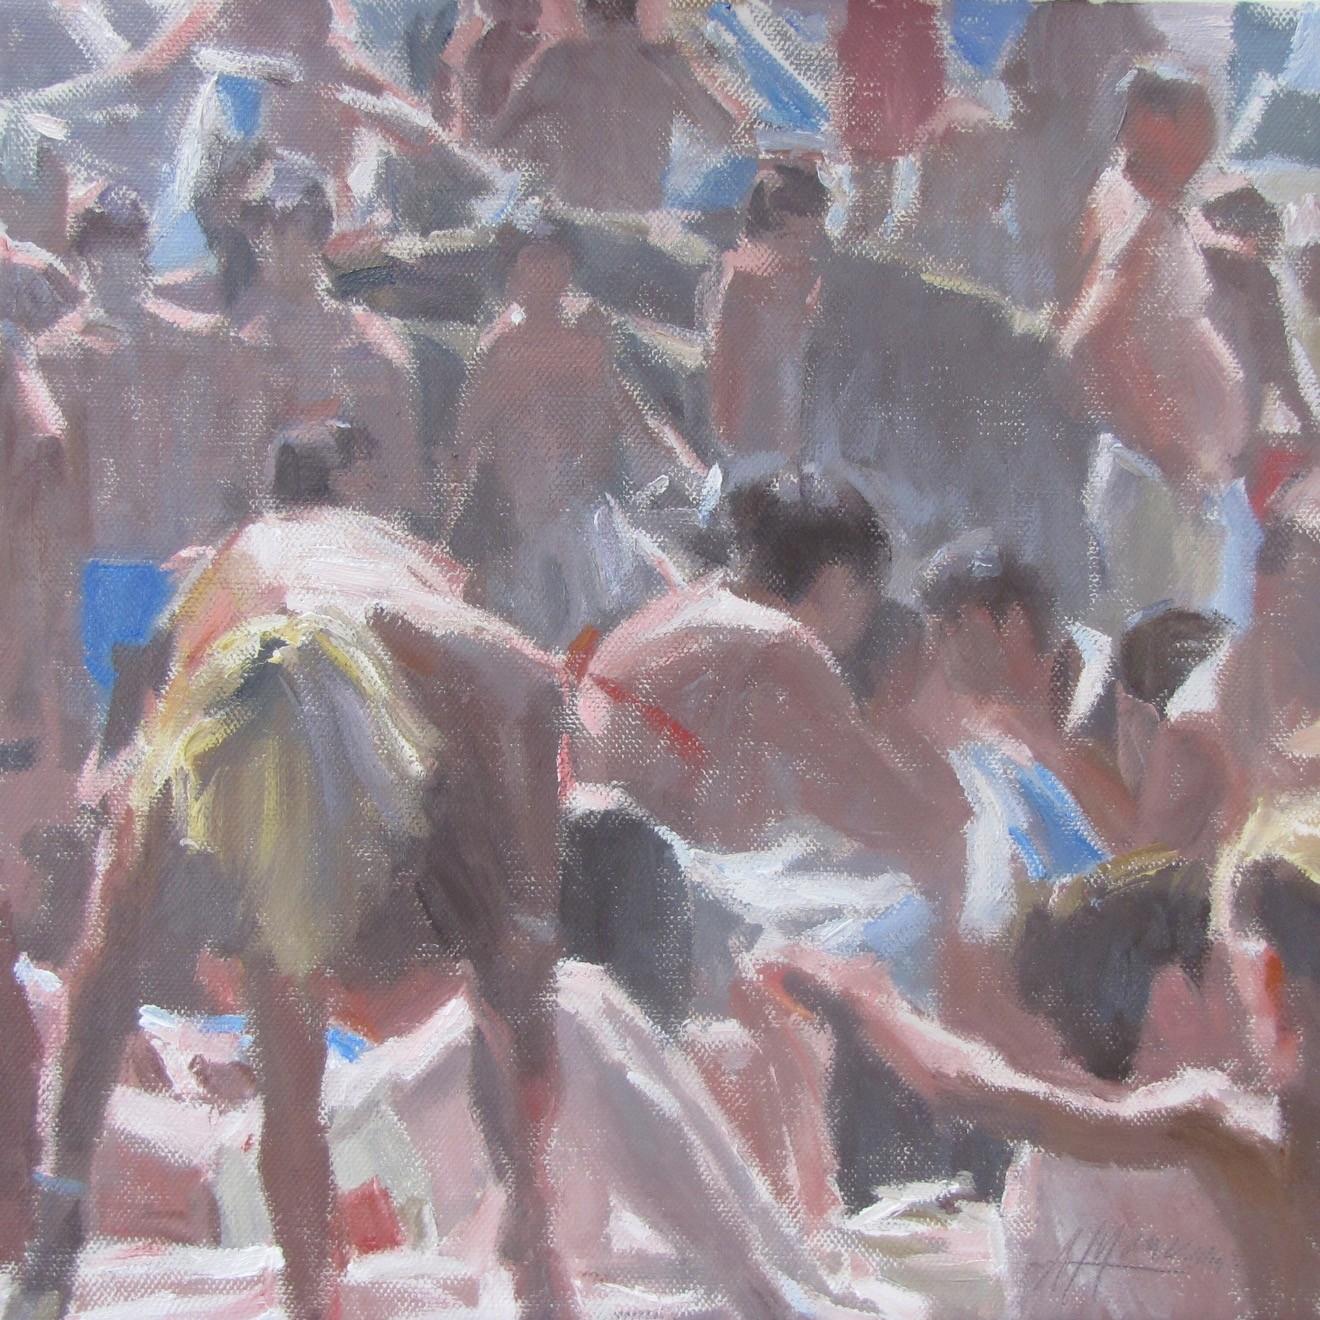 01468 Bagnanti, di Andrea Mancini. Olio su tela, cm 40x40